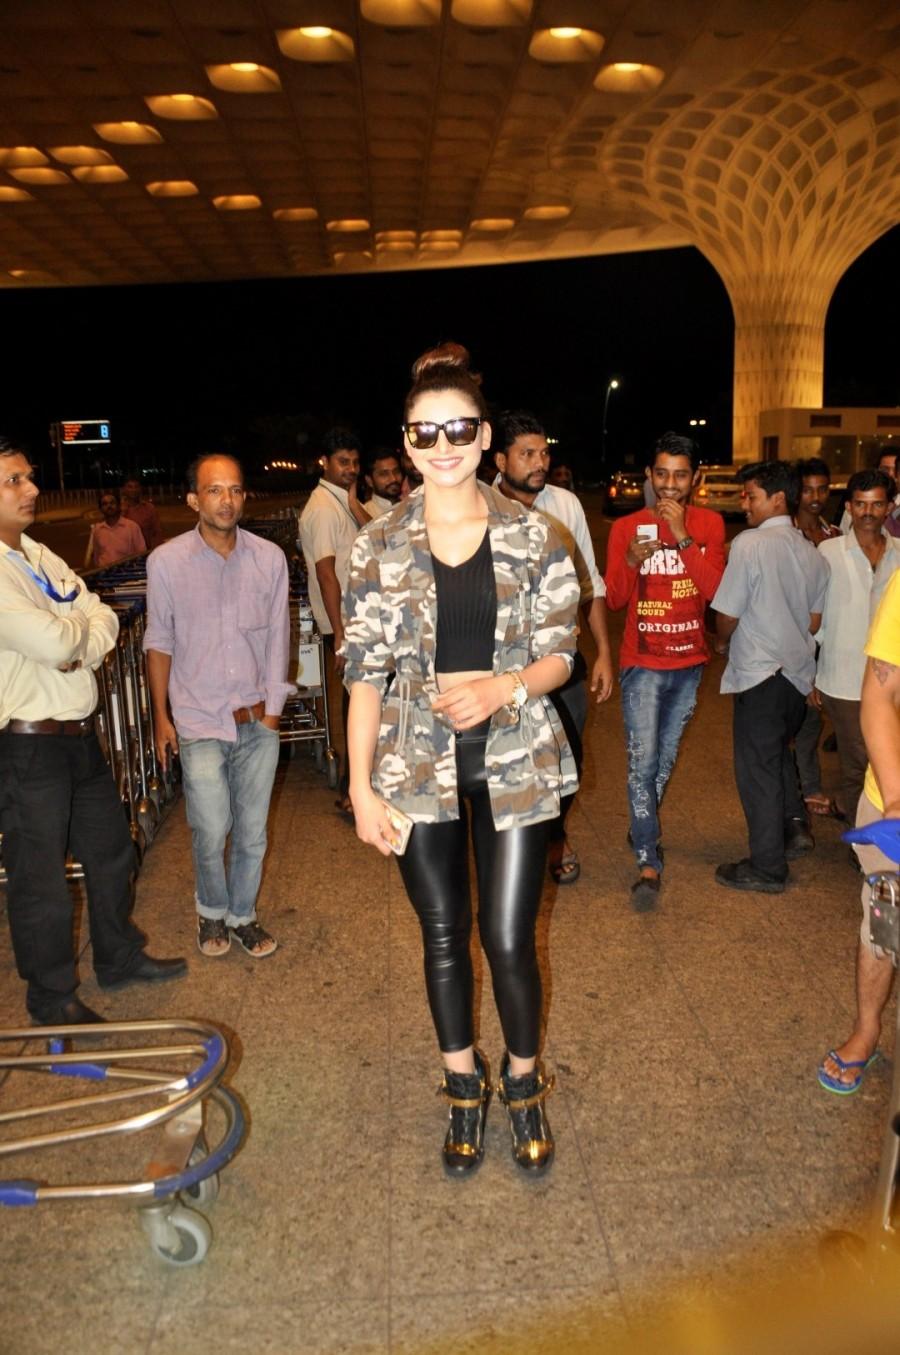 Urvashi Rautela,Urvashi Rautela at SIIMA Awards,SIIMA Awards,SIIMA Awards 2016,SIIMA Awards pics,SIIMA Awards images,SIIMA Awards stills,SIIMA Awards pictures,actress Urvashi Rautela,Urvashi Rautela at Airport